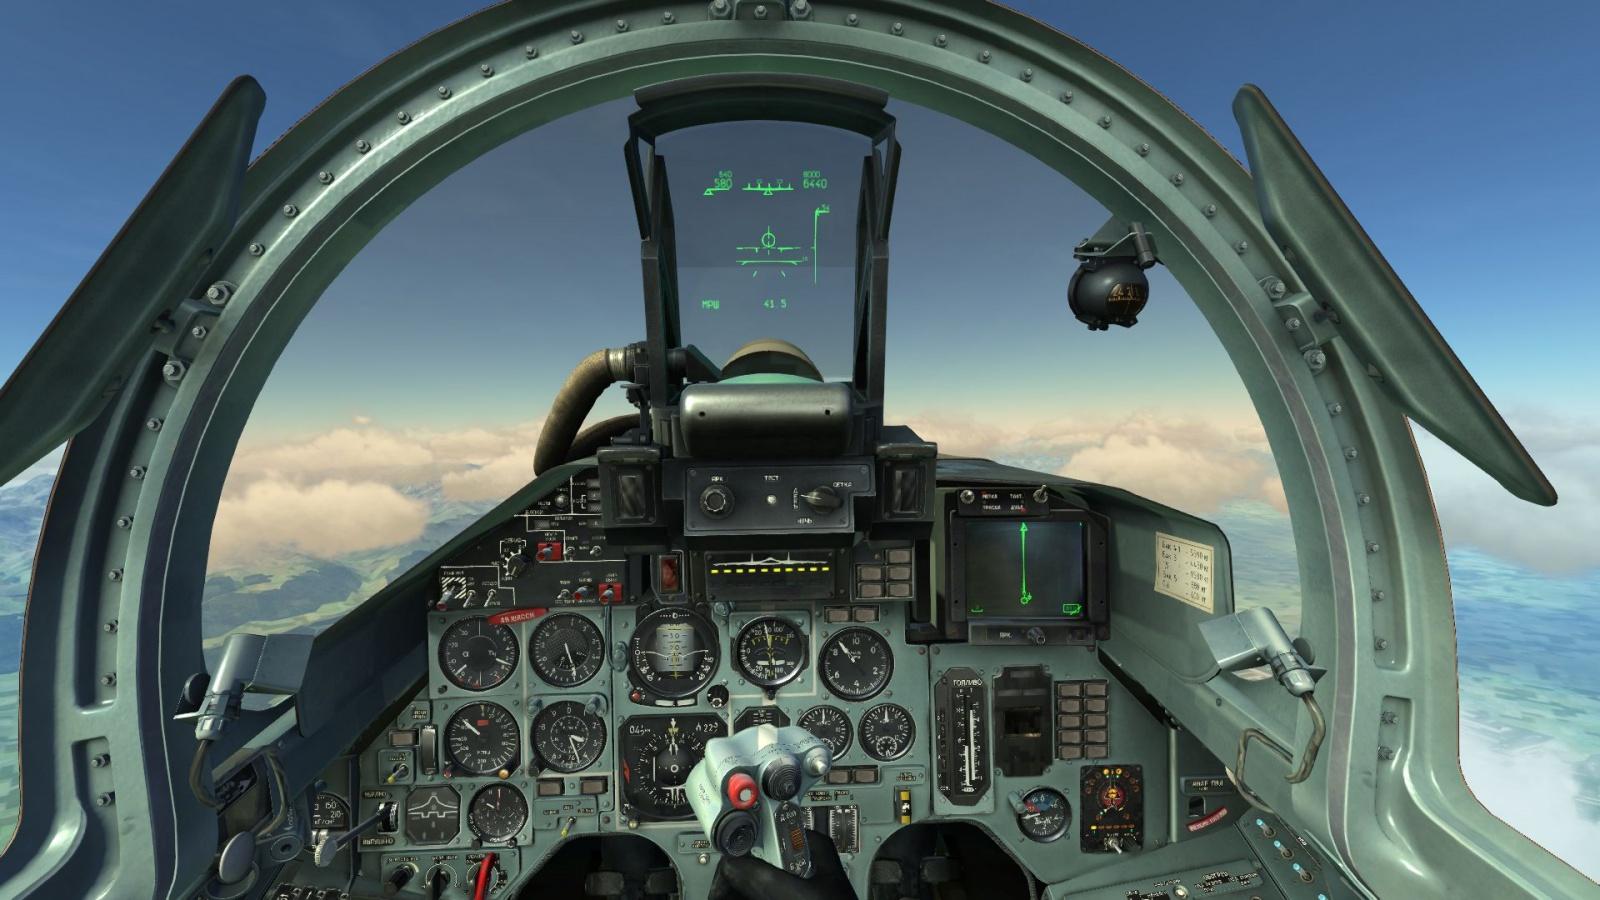 Volatus Virtualis: Love the turboprop